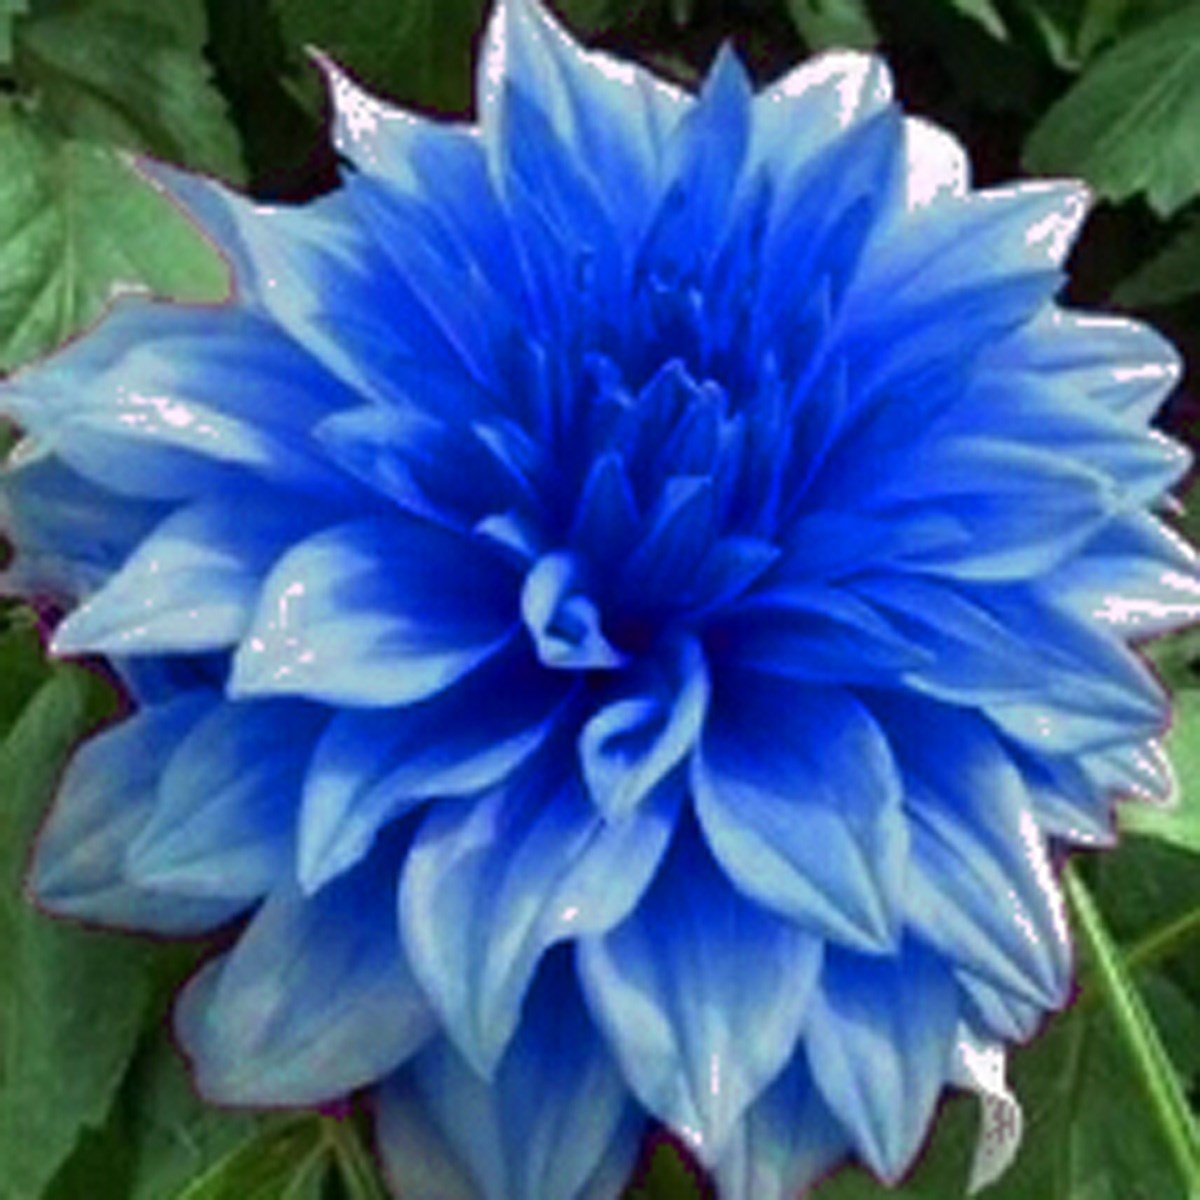 Futaba blue fireball dahlia flower seeds 20 seeds amazon futaba blue fireball dahlia flower seeds 20 seeds amazon garden outdoors izmirmasajfo